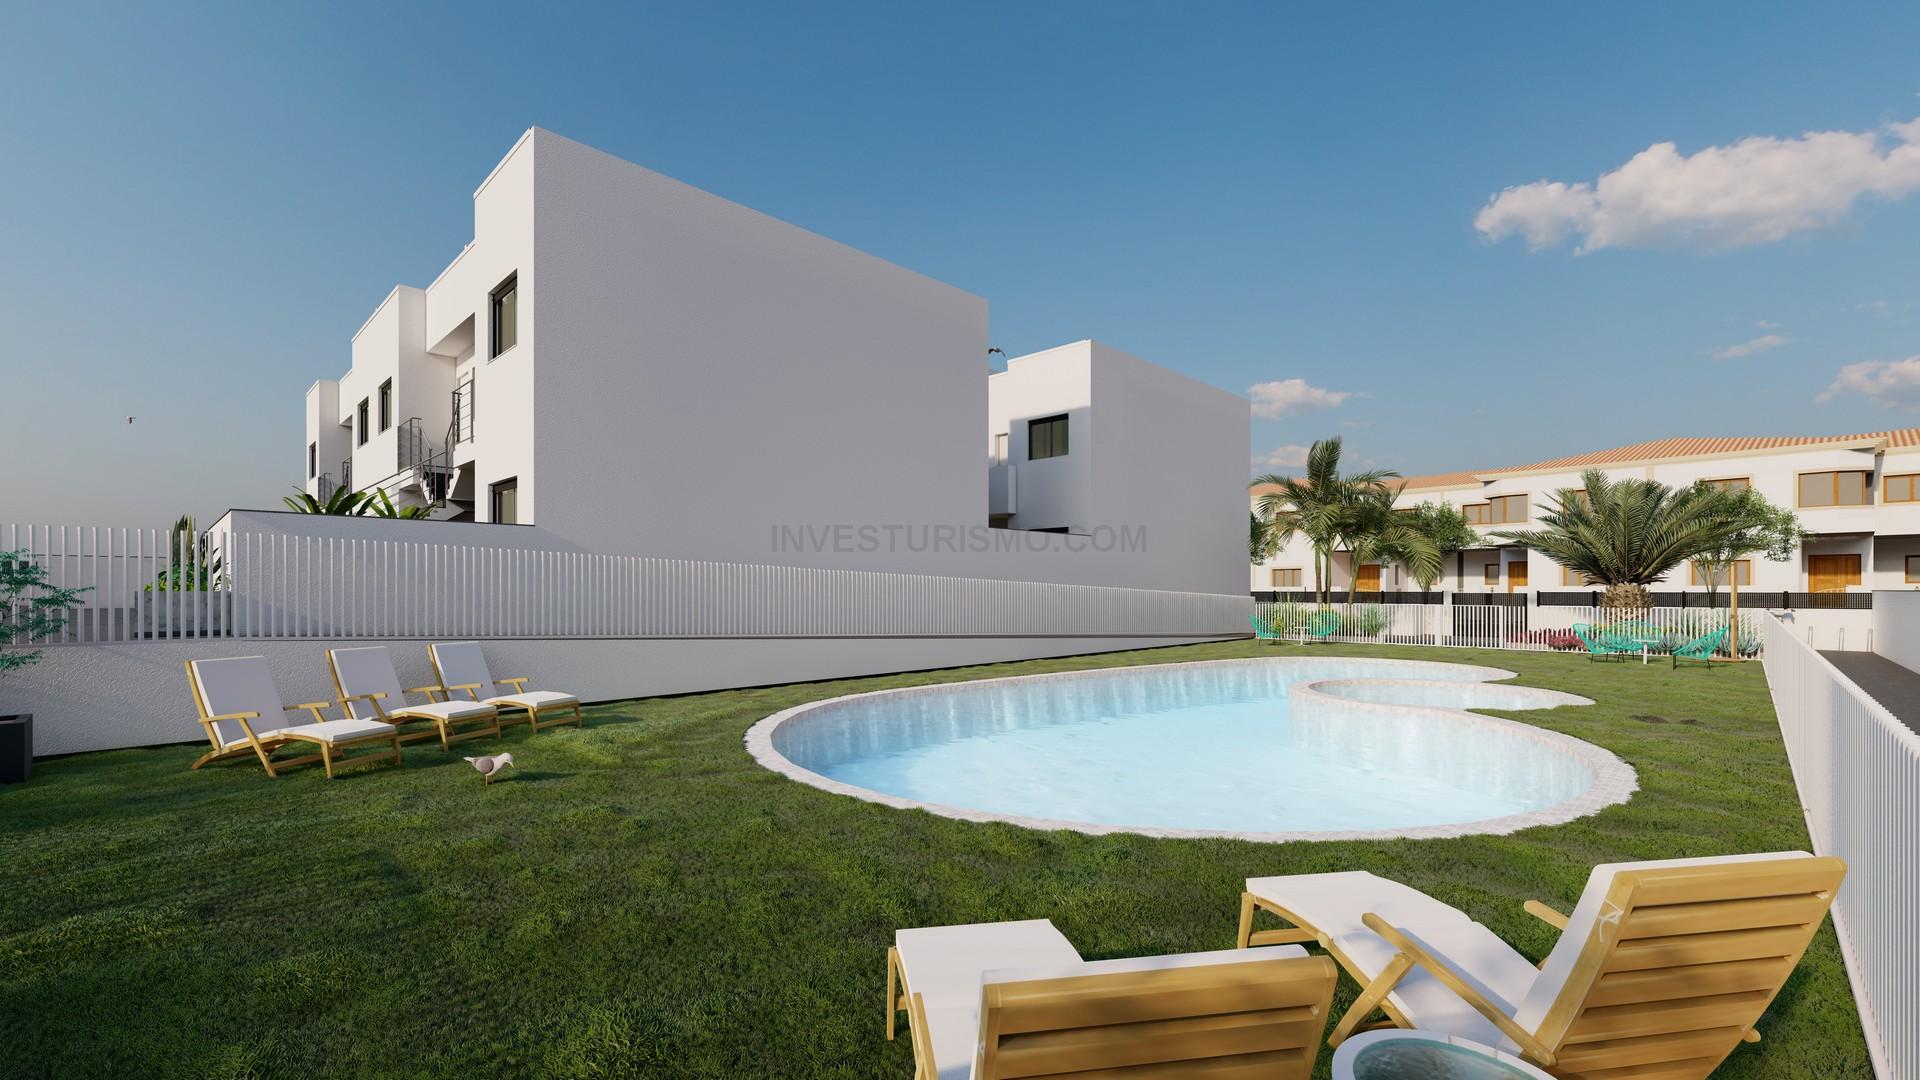 New build Bungalows 2 bedrooms in Torre de la horadada